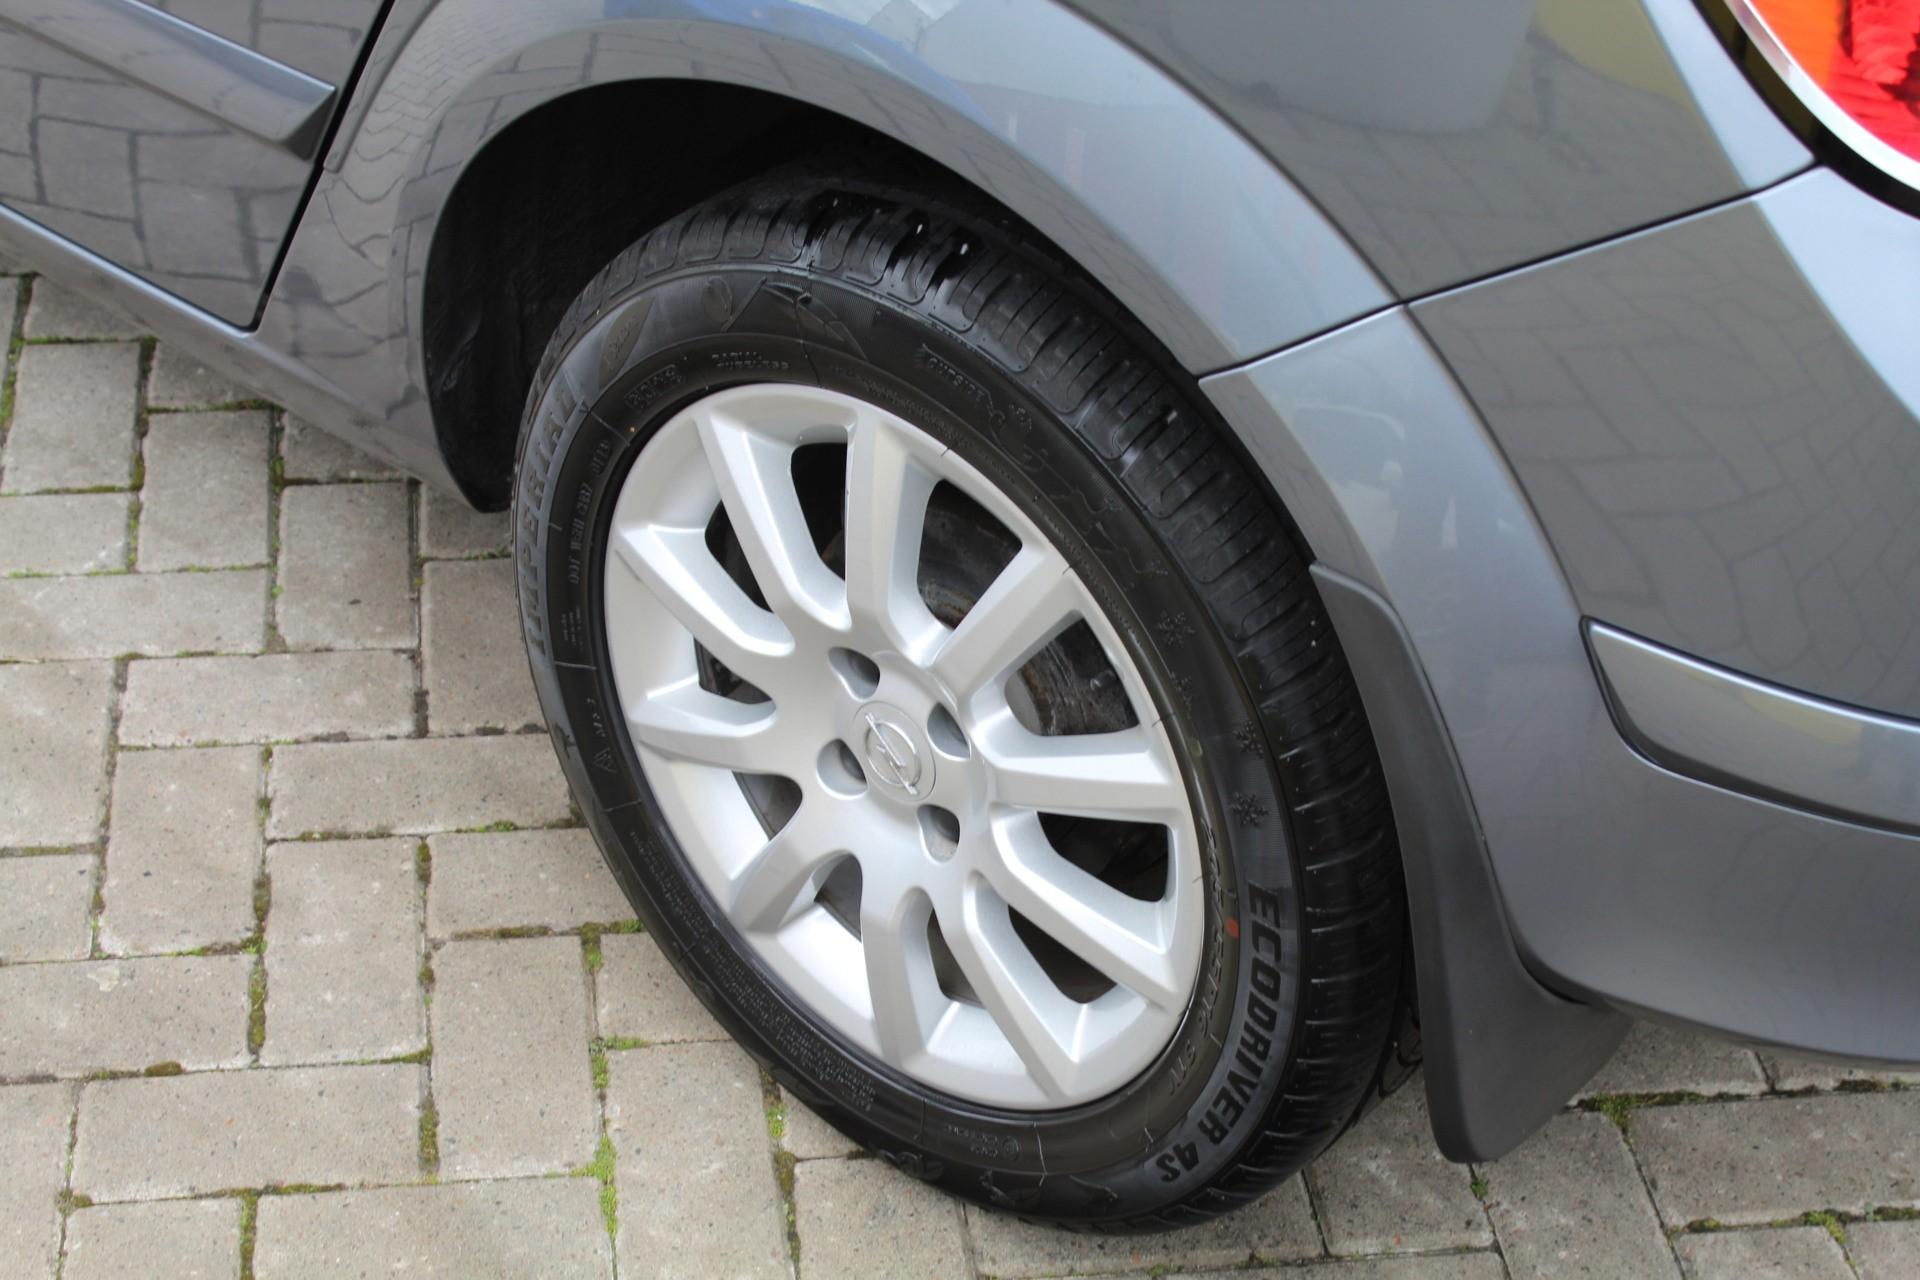 Caroutlet Groningen - Opel Astra 1.4 Enjoy | AIRCO | TREKHAAK | LICHTMETALEN VELGEN |